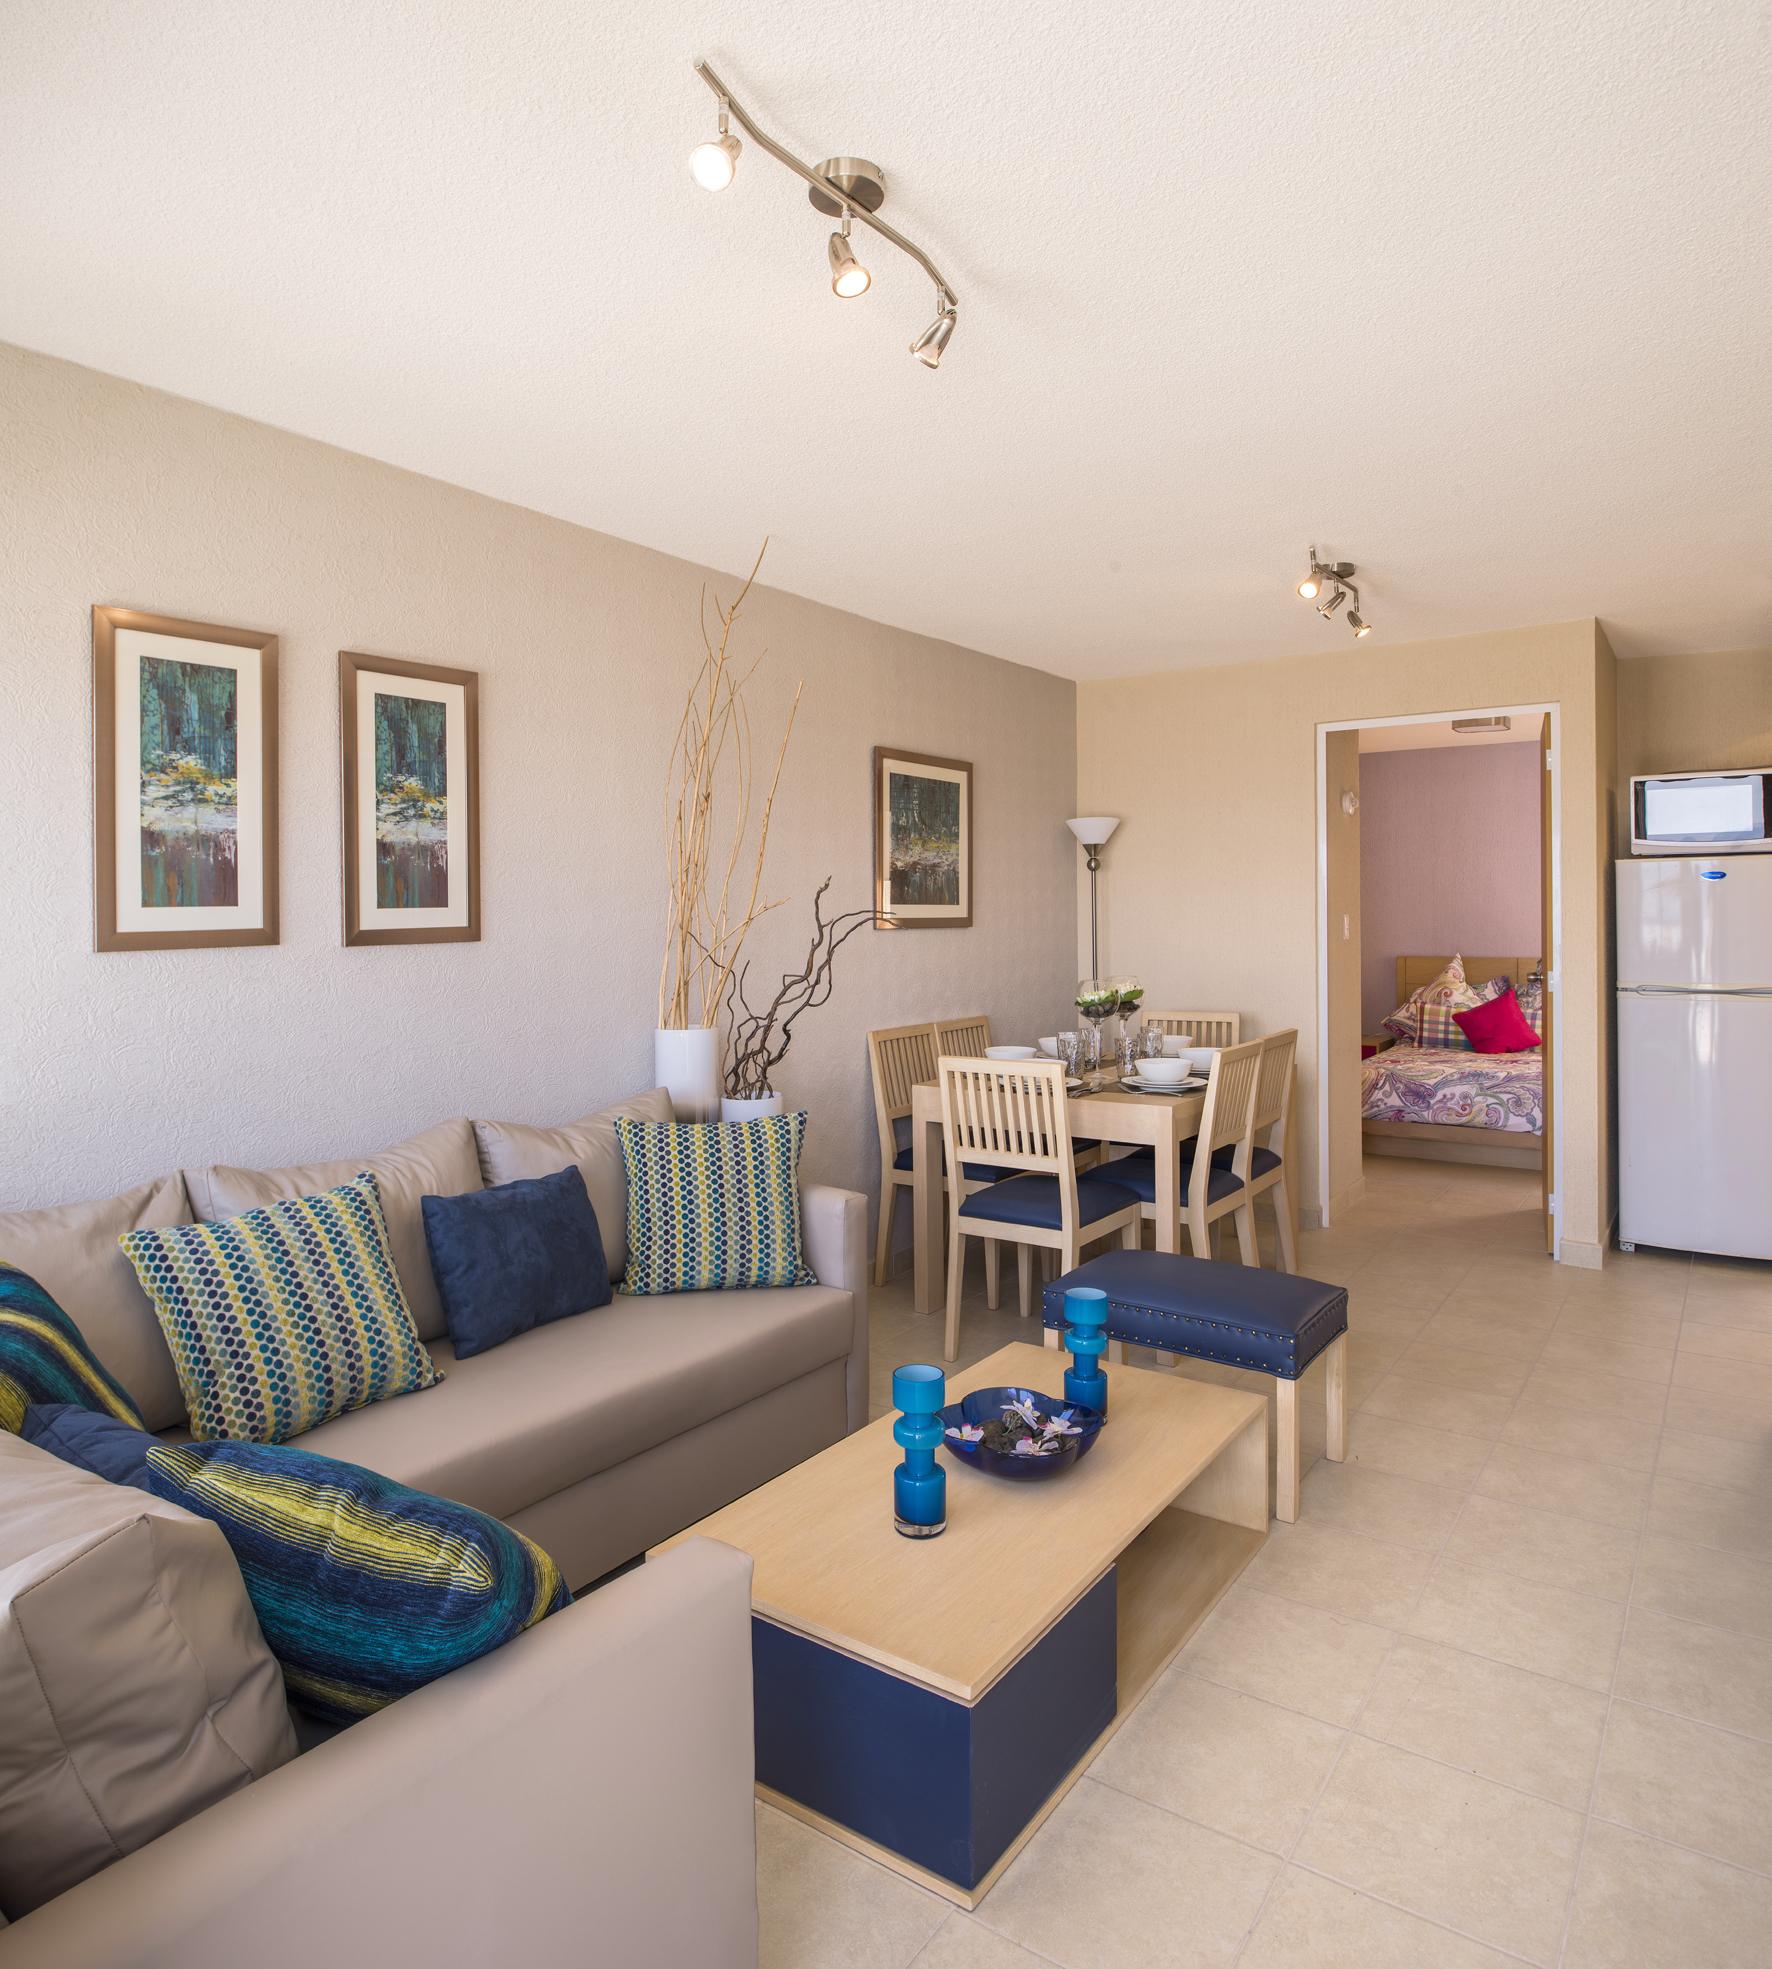 Espaciosa sala de casa modelo cupido 3r